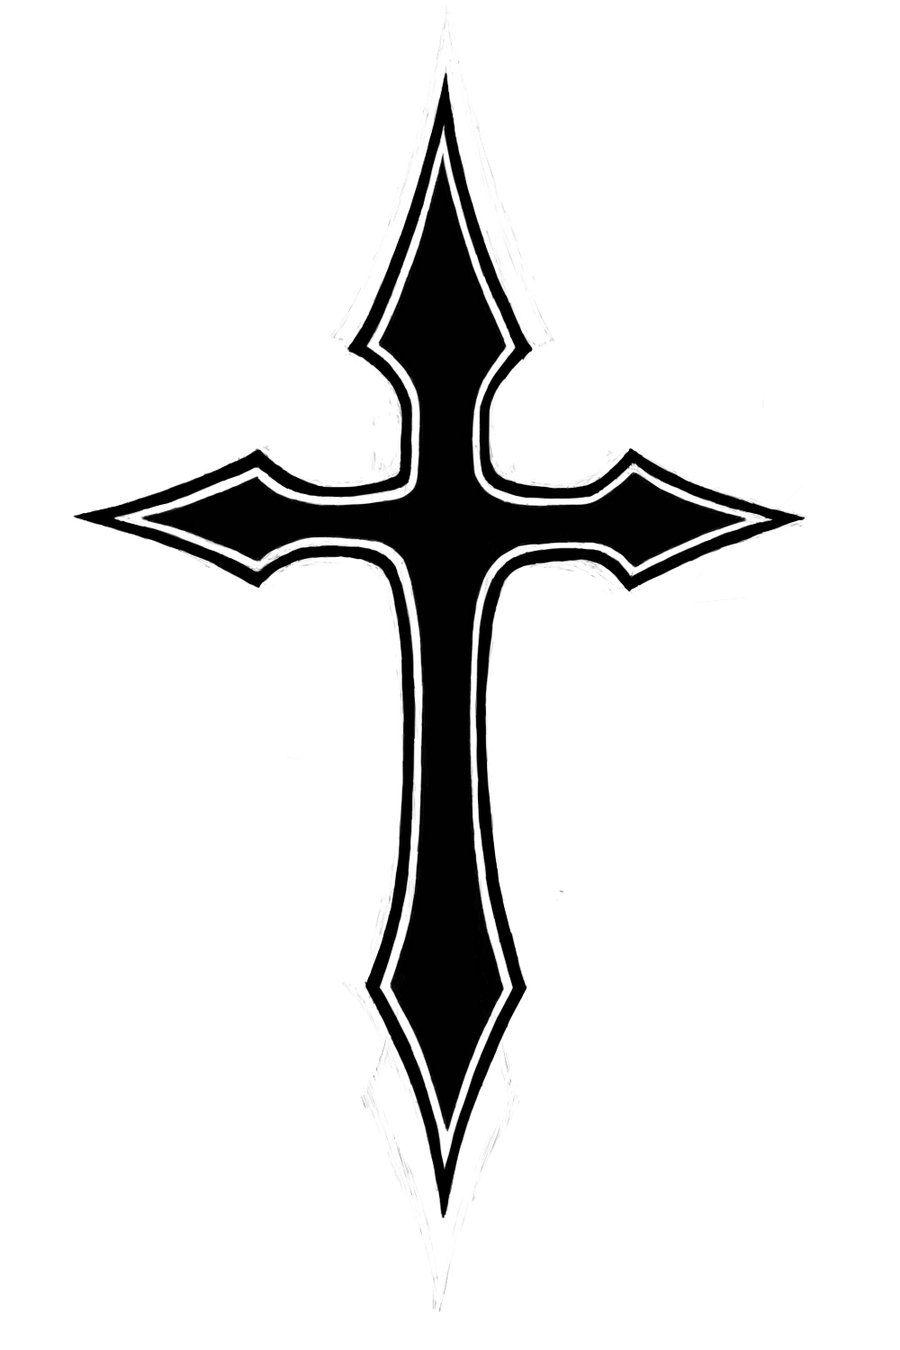 pix for solid black cross tattoo designs tatoo pinterest black cross. Black Bedroom Furniture Sets. Home Design Ideas